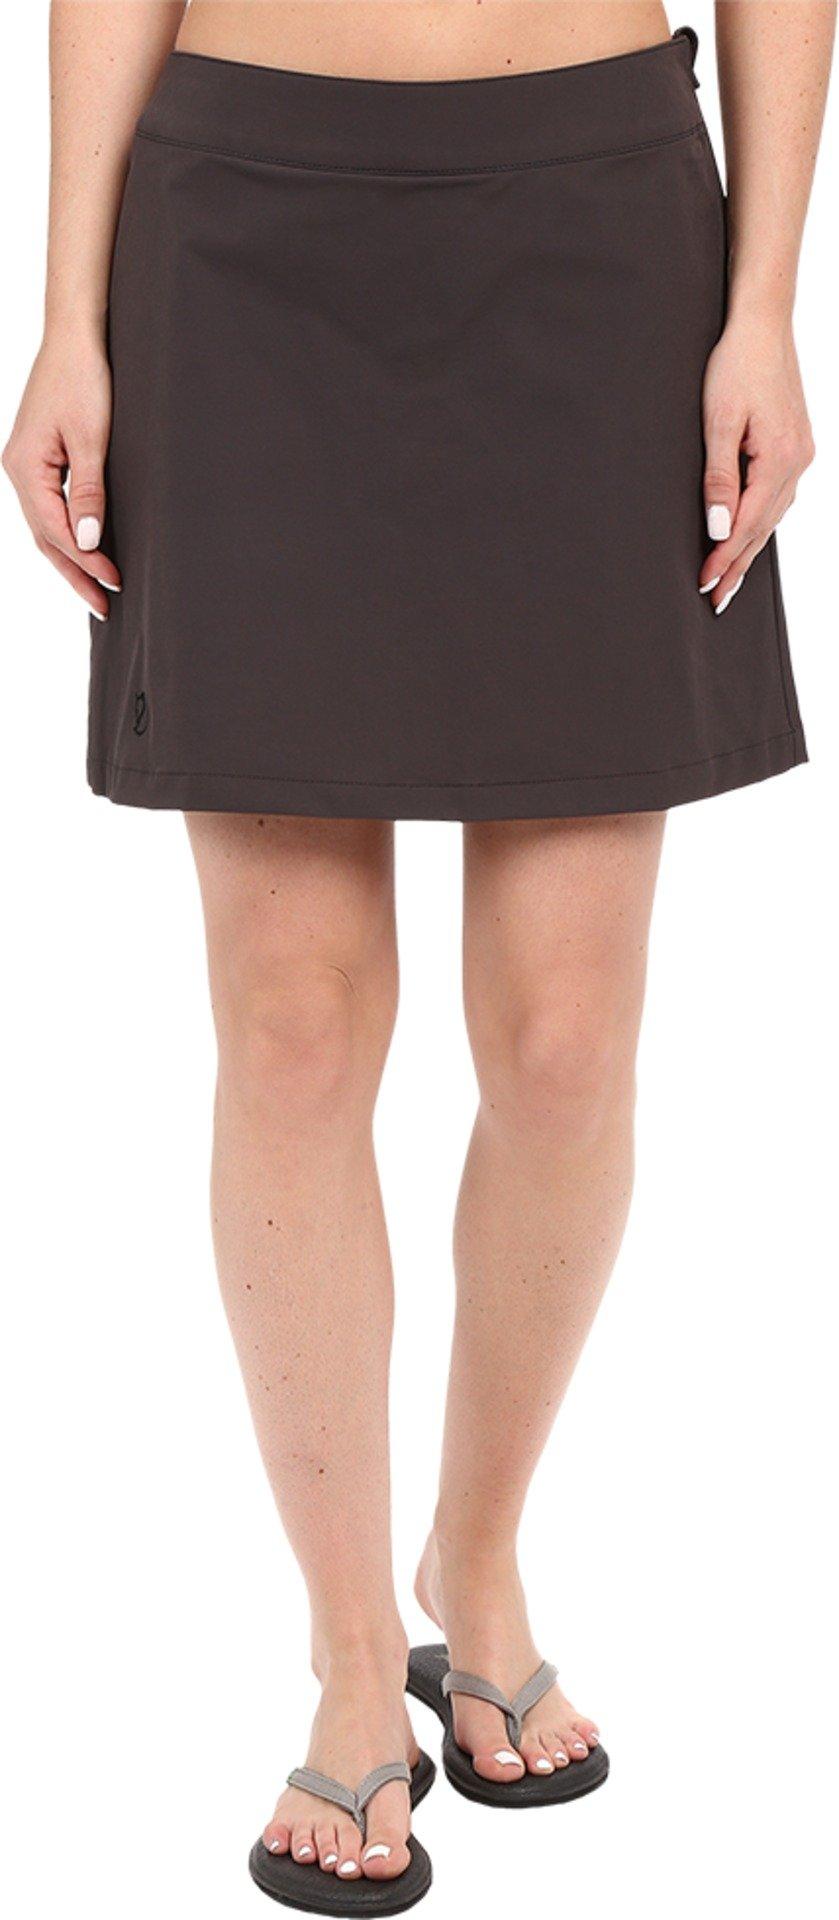 Fjallraven Women's Abisko Trekking Skort Dark Grey Skirt XS X 11.5